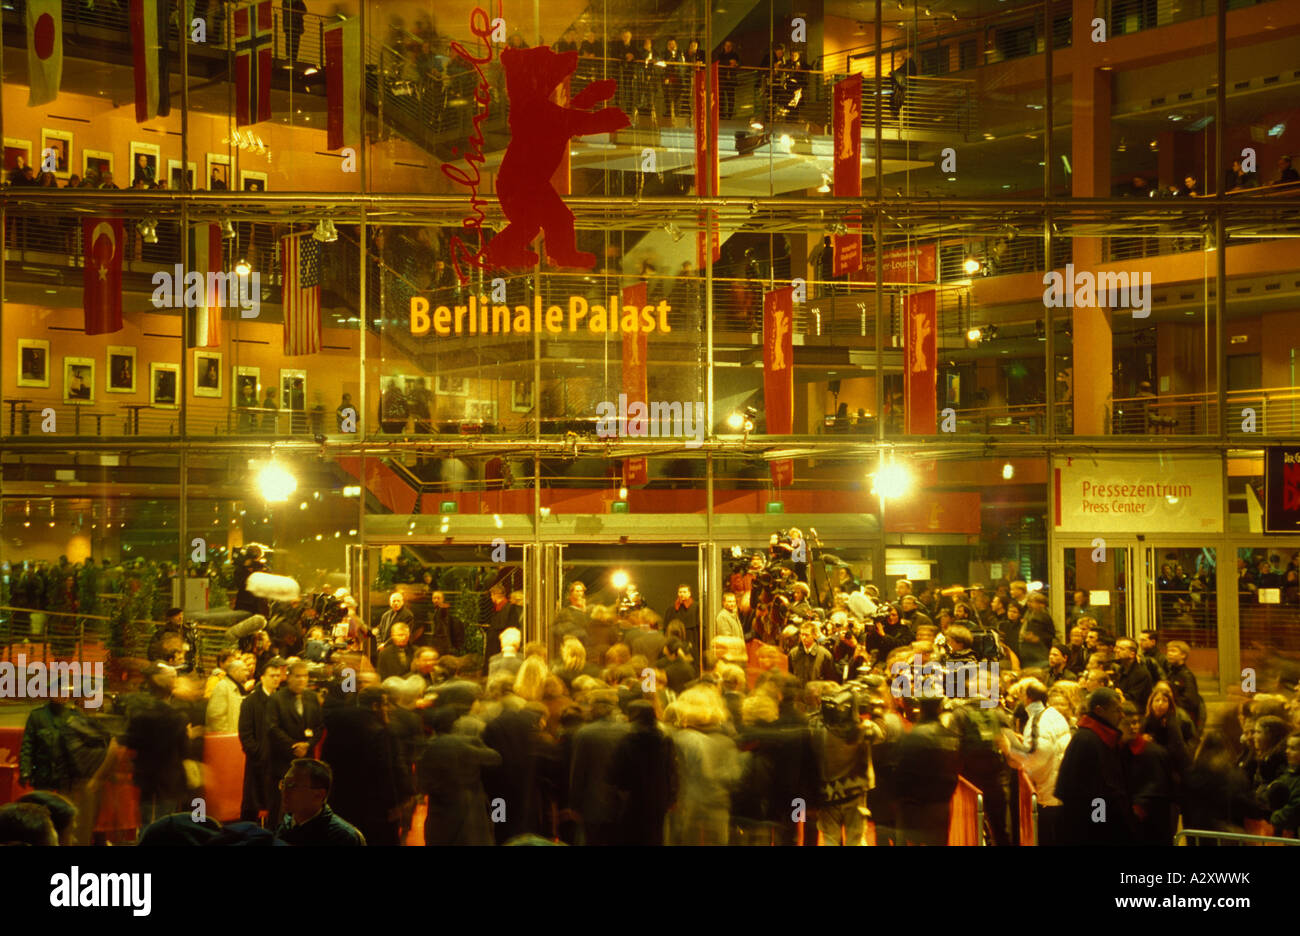 berlin berlinale internationale filmfestspiele berlinale palast stock photo royalty free. Black Bedroom Furniture Sets. Home Design Ideas